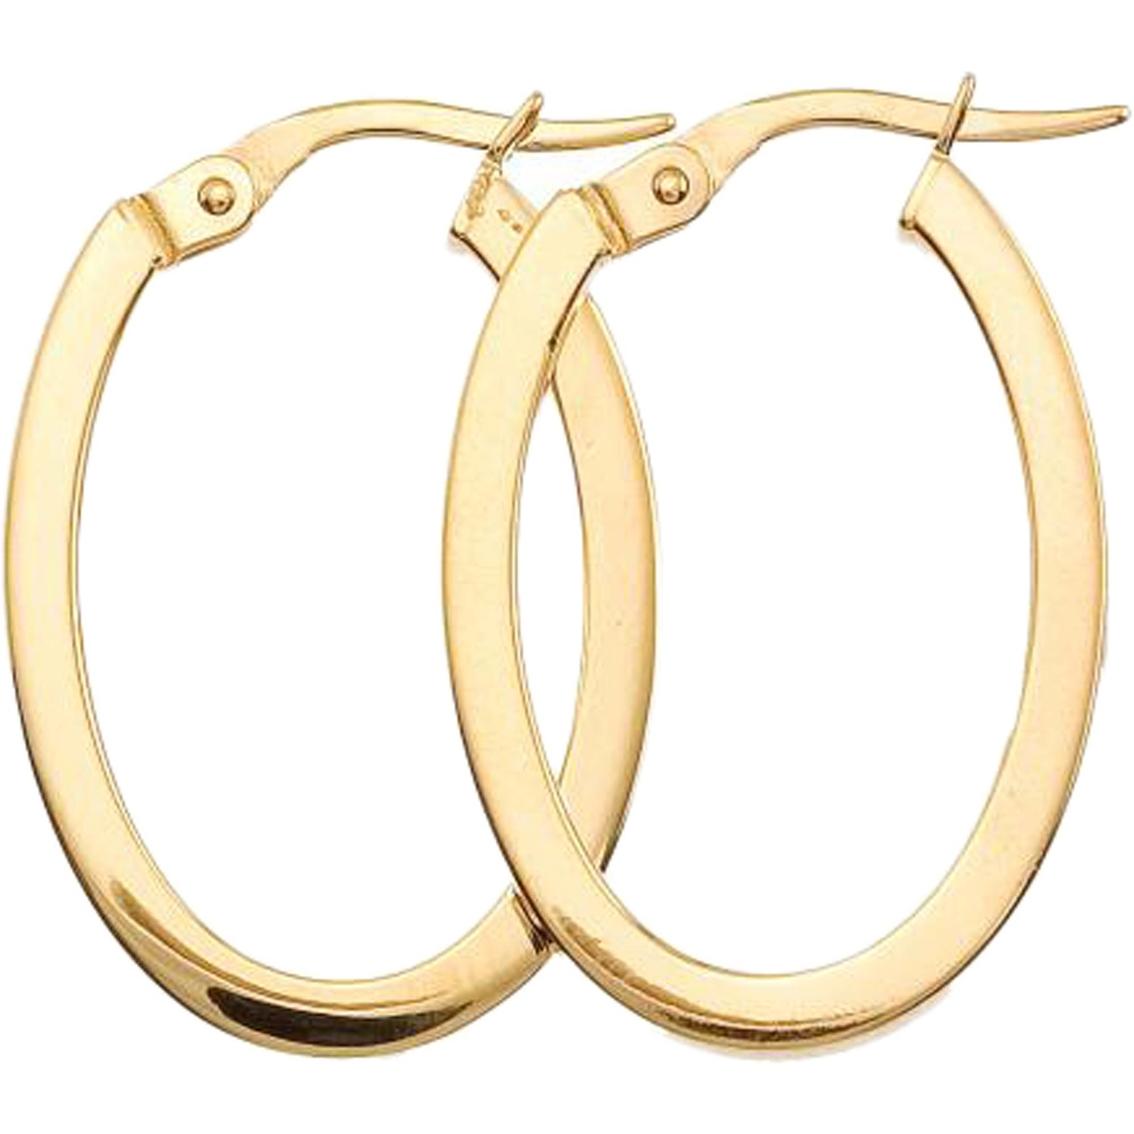 roberto coin yellow gold hoop earrings